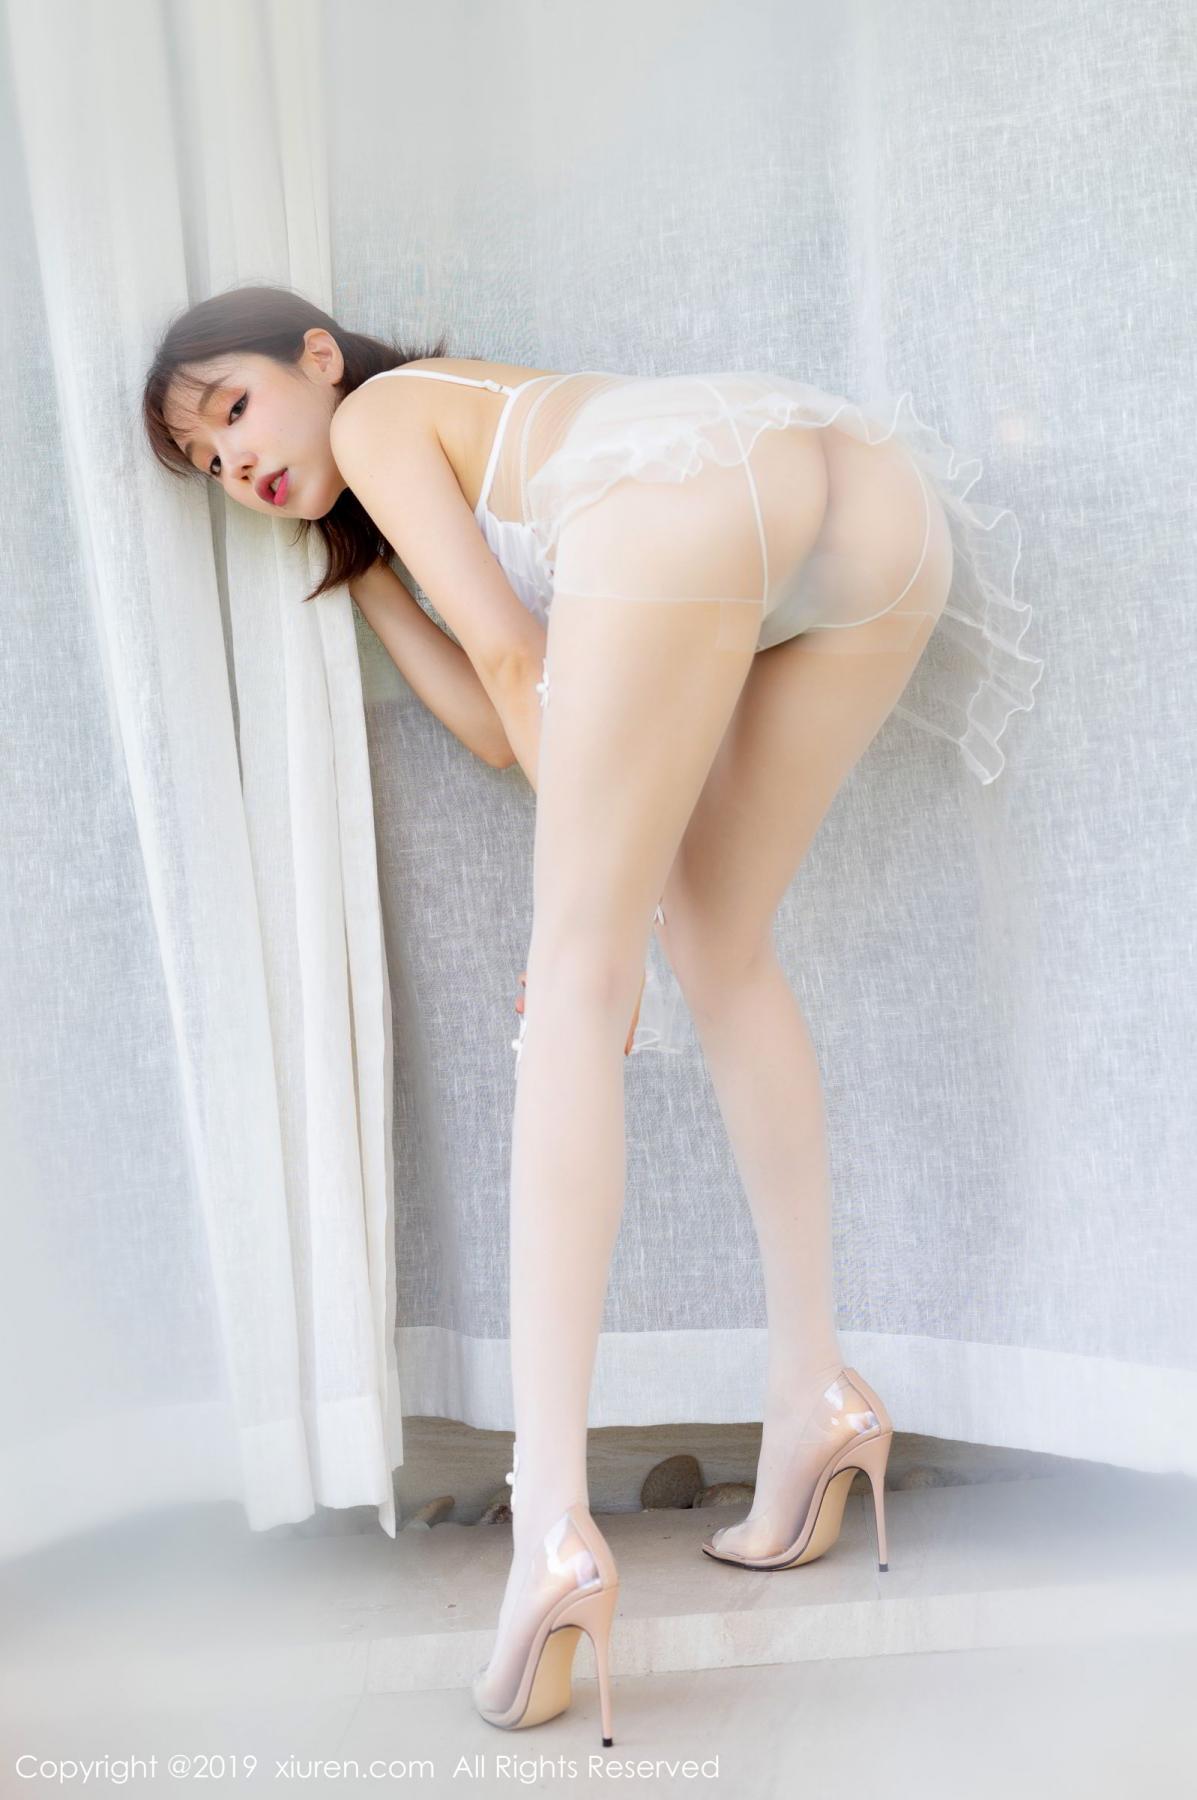 [XiuRen] Vol.1578 Huang Le Ran 27P, Huang Le Ran, Underwear, Xiuren